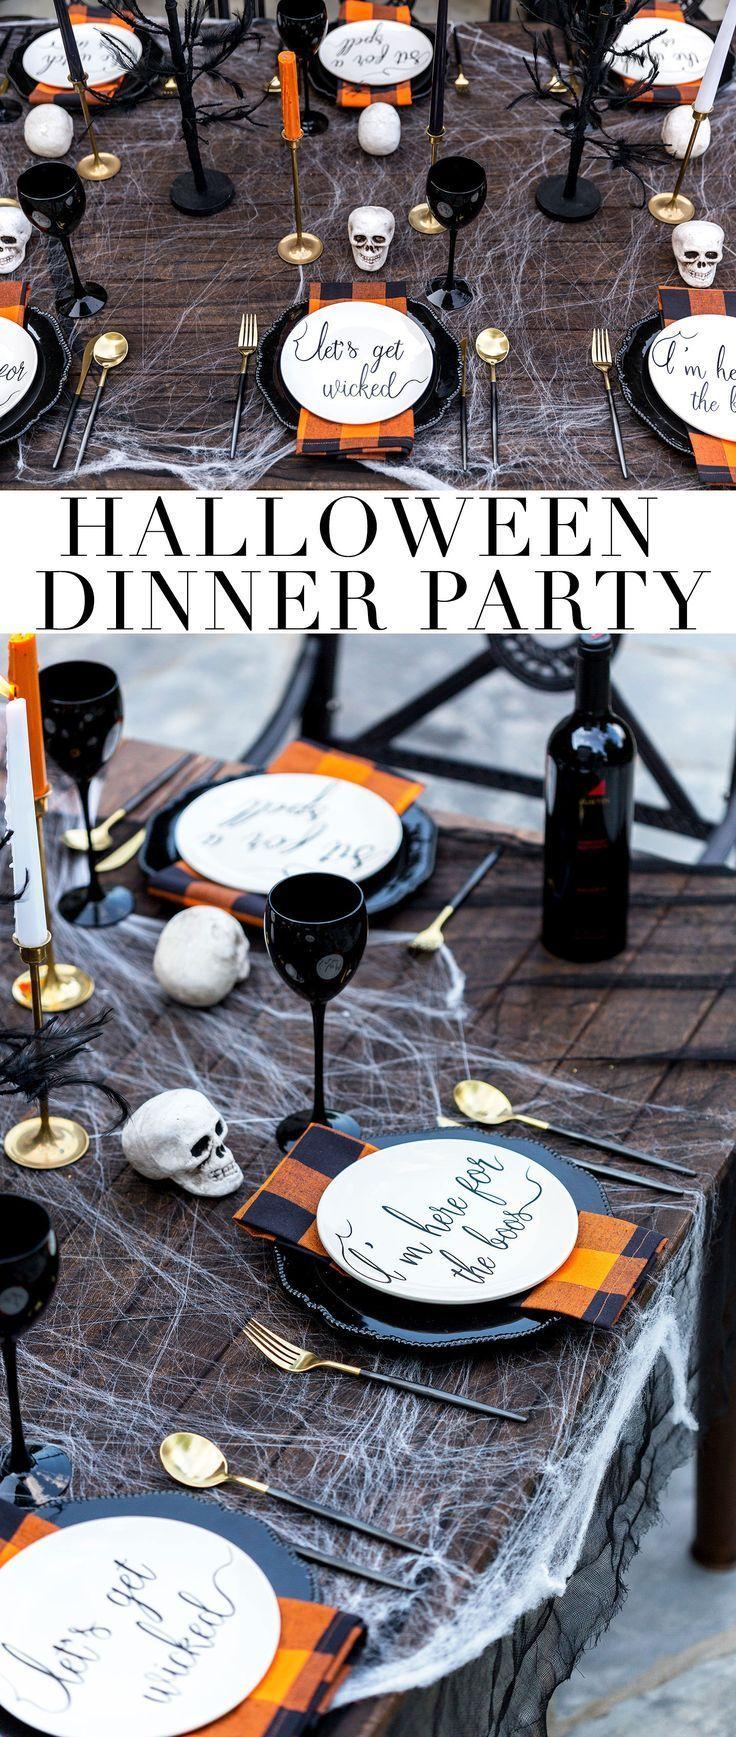 Adult Halloween Party Decorations & Halloween Menu Ideas